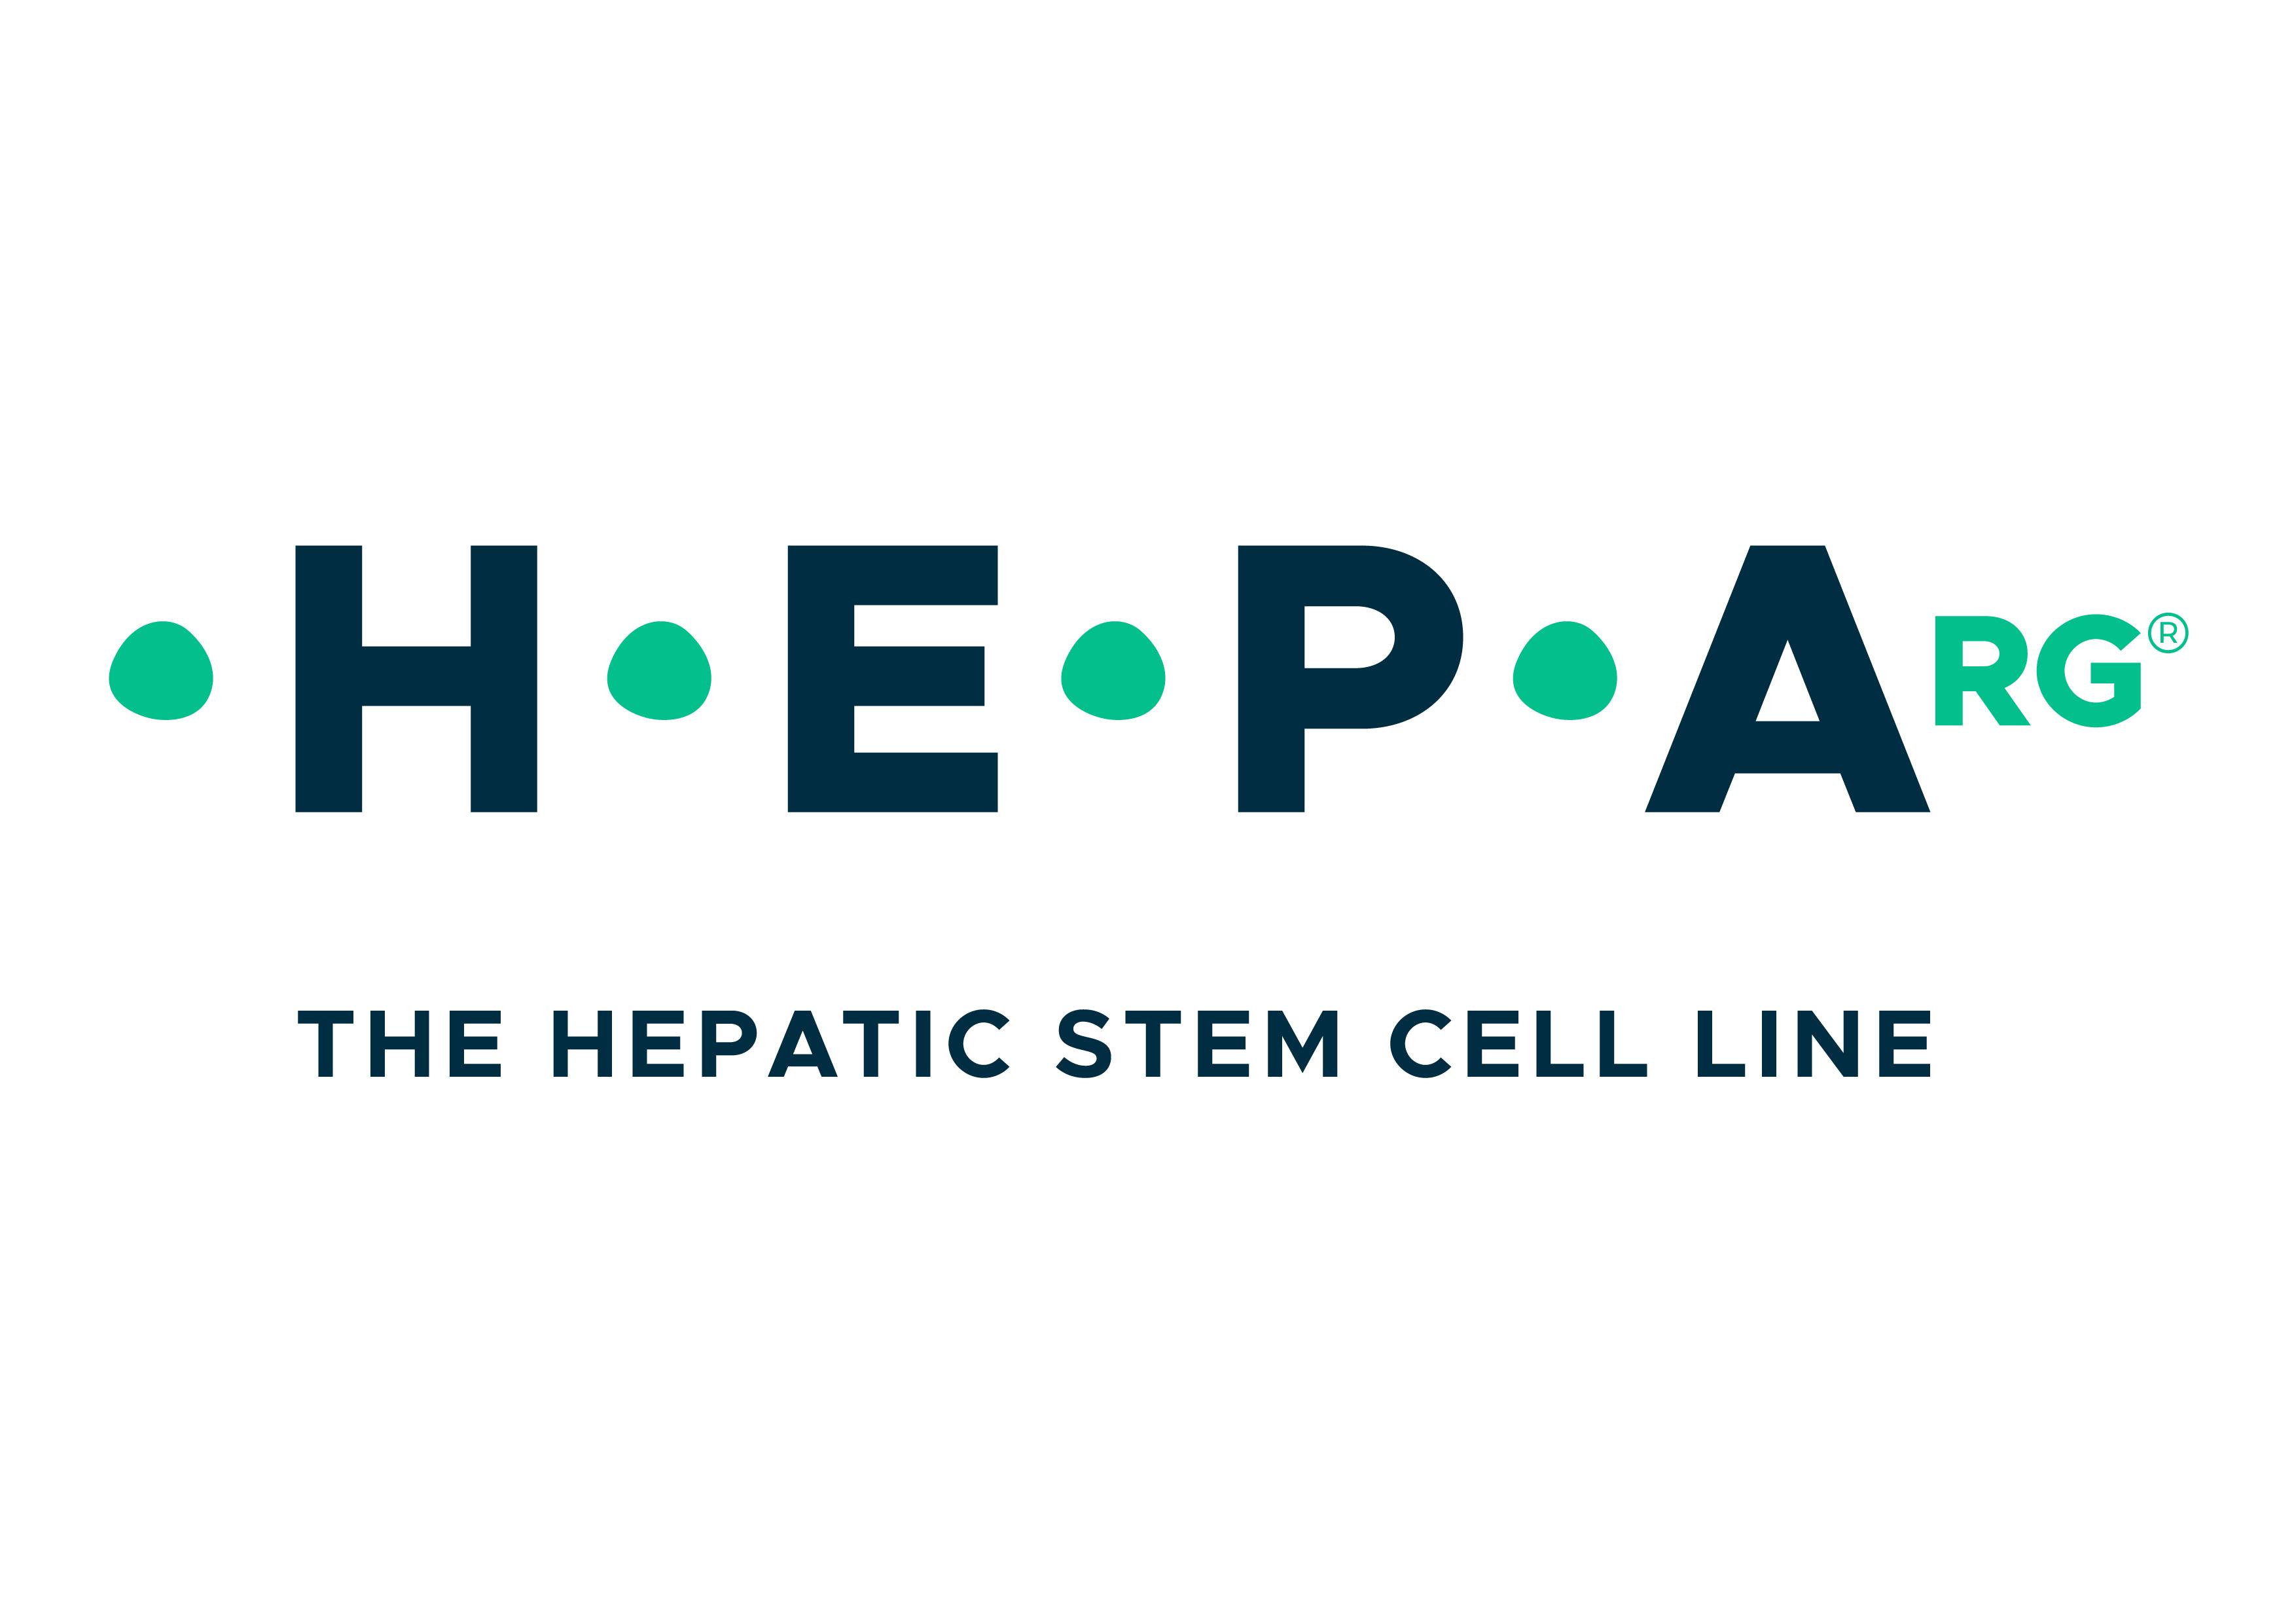 HepaRG logo